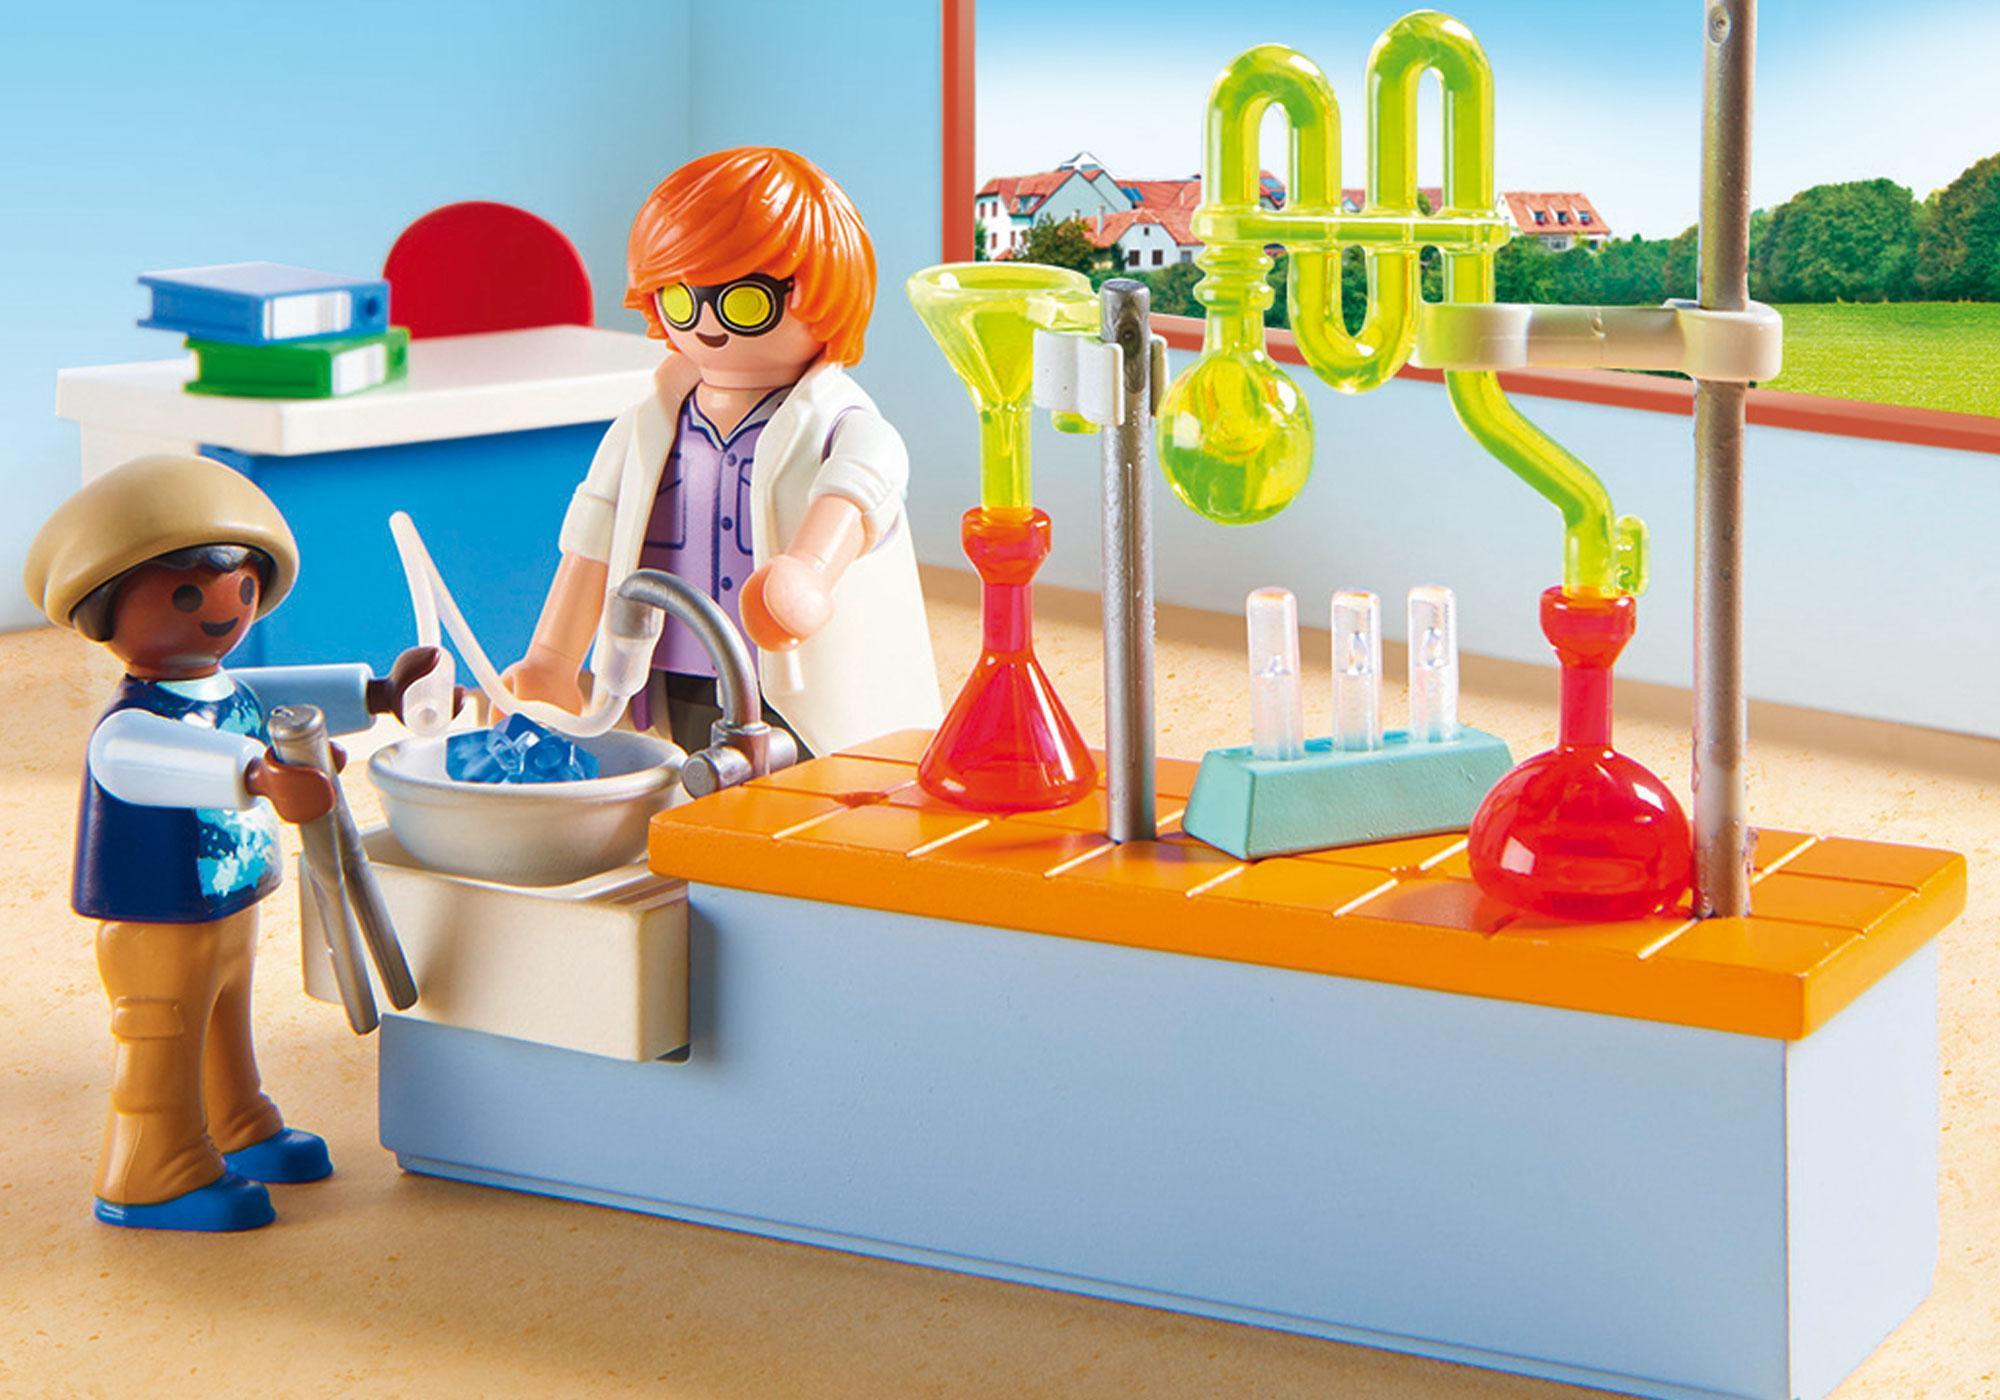 http://media.playmobil.com/i/playmobil/9456_product_extra1/Chemieunterricht